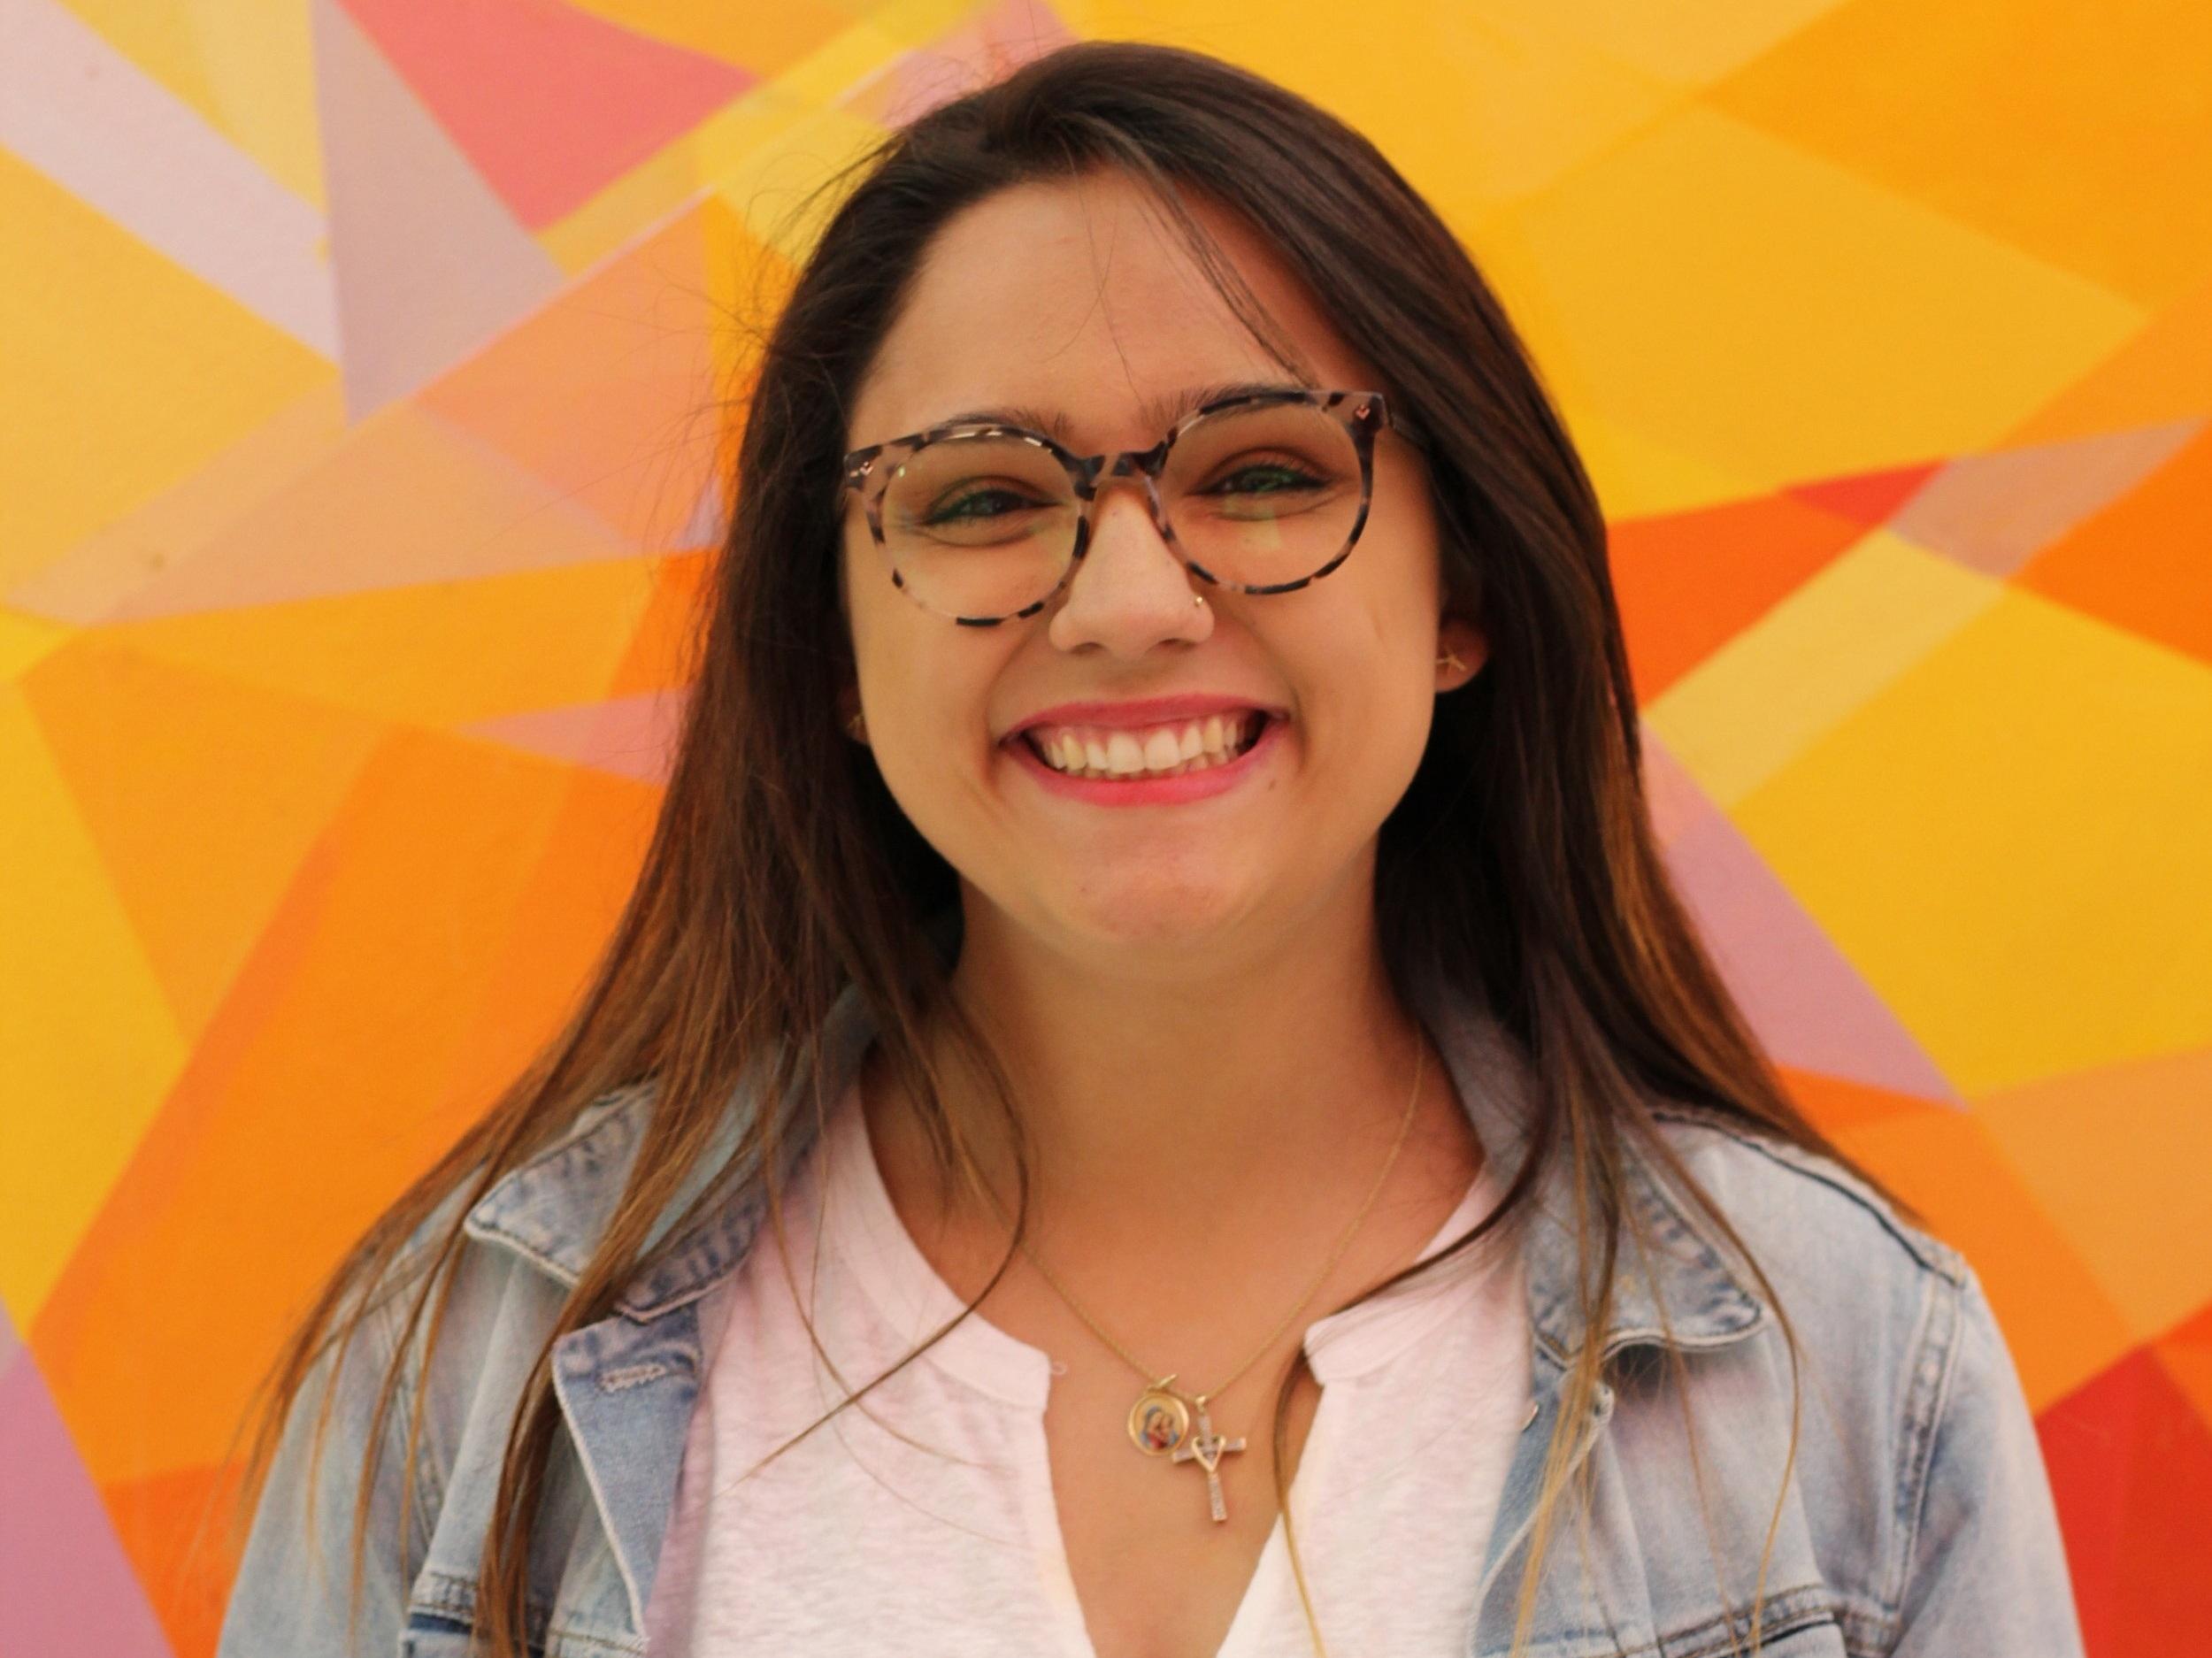 Elizabeth Caccavano - Co-Chairelizabeth.caccavano@temple.edu